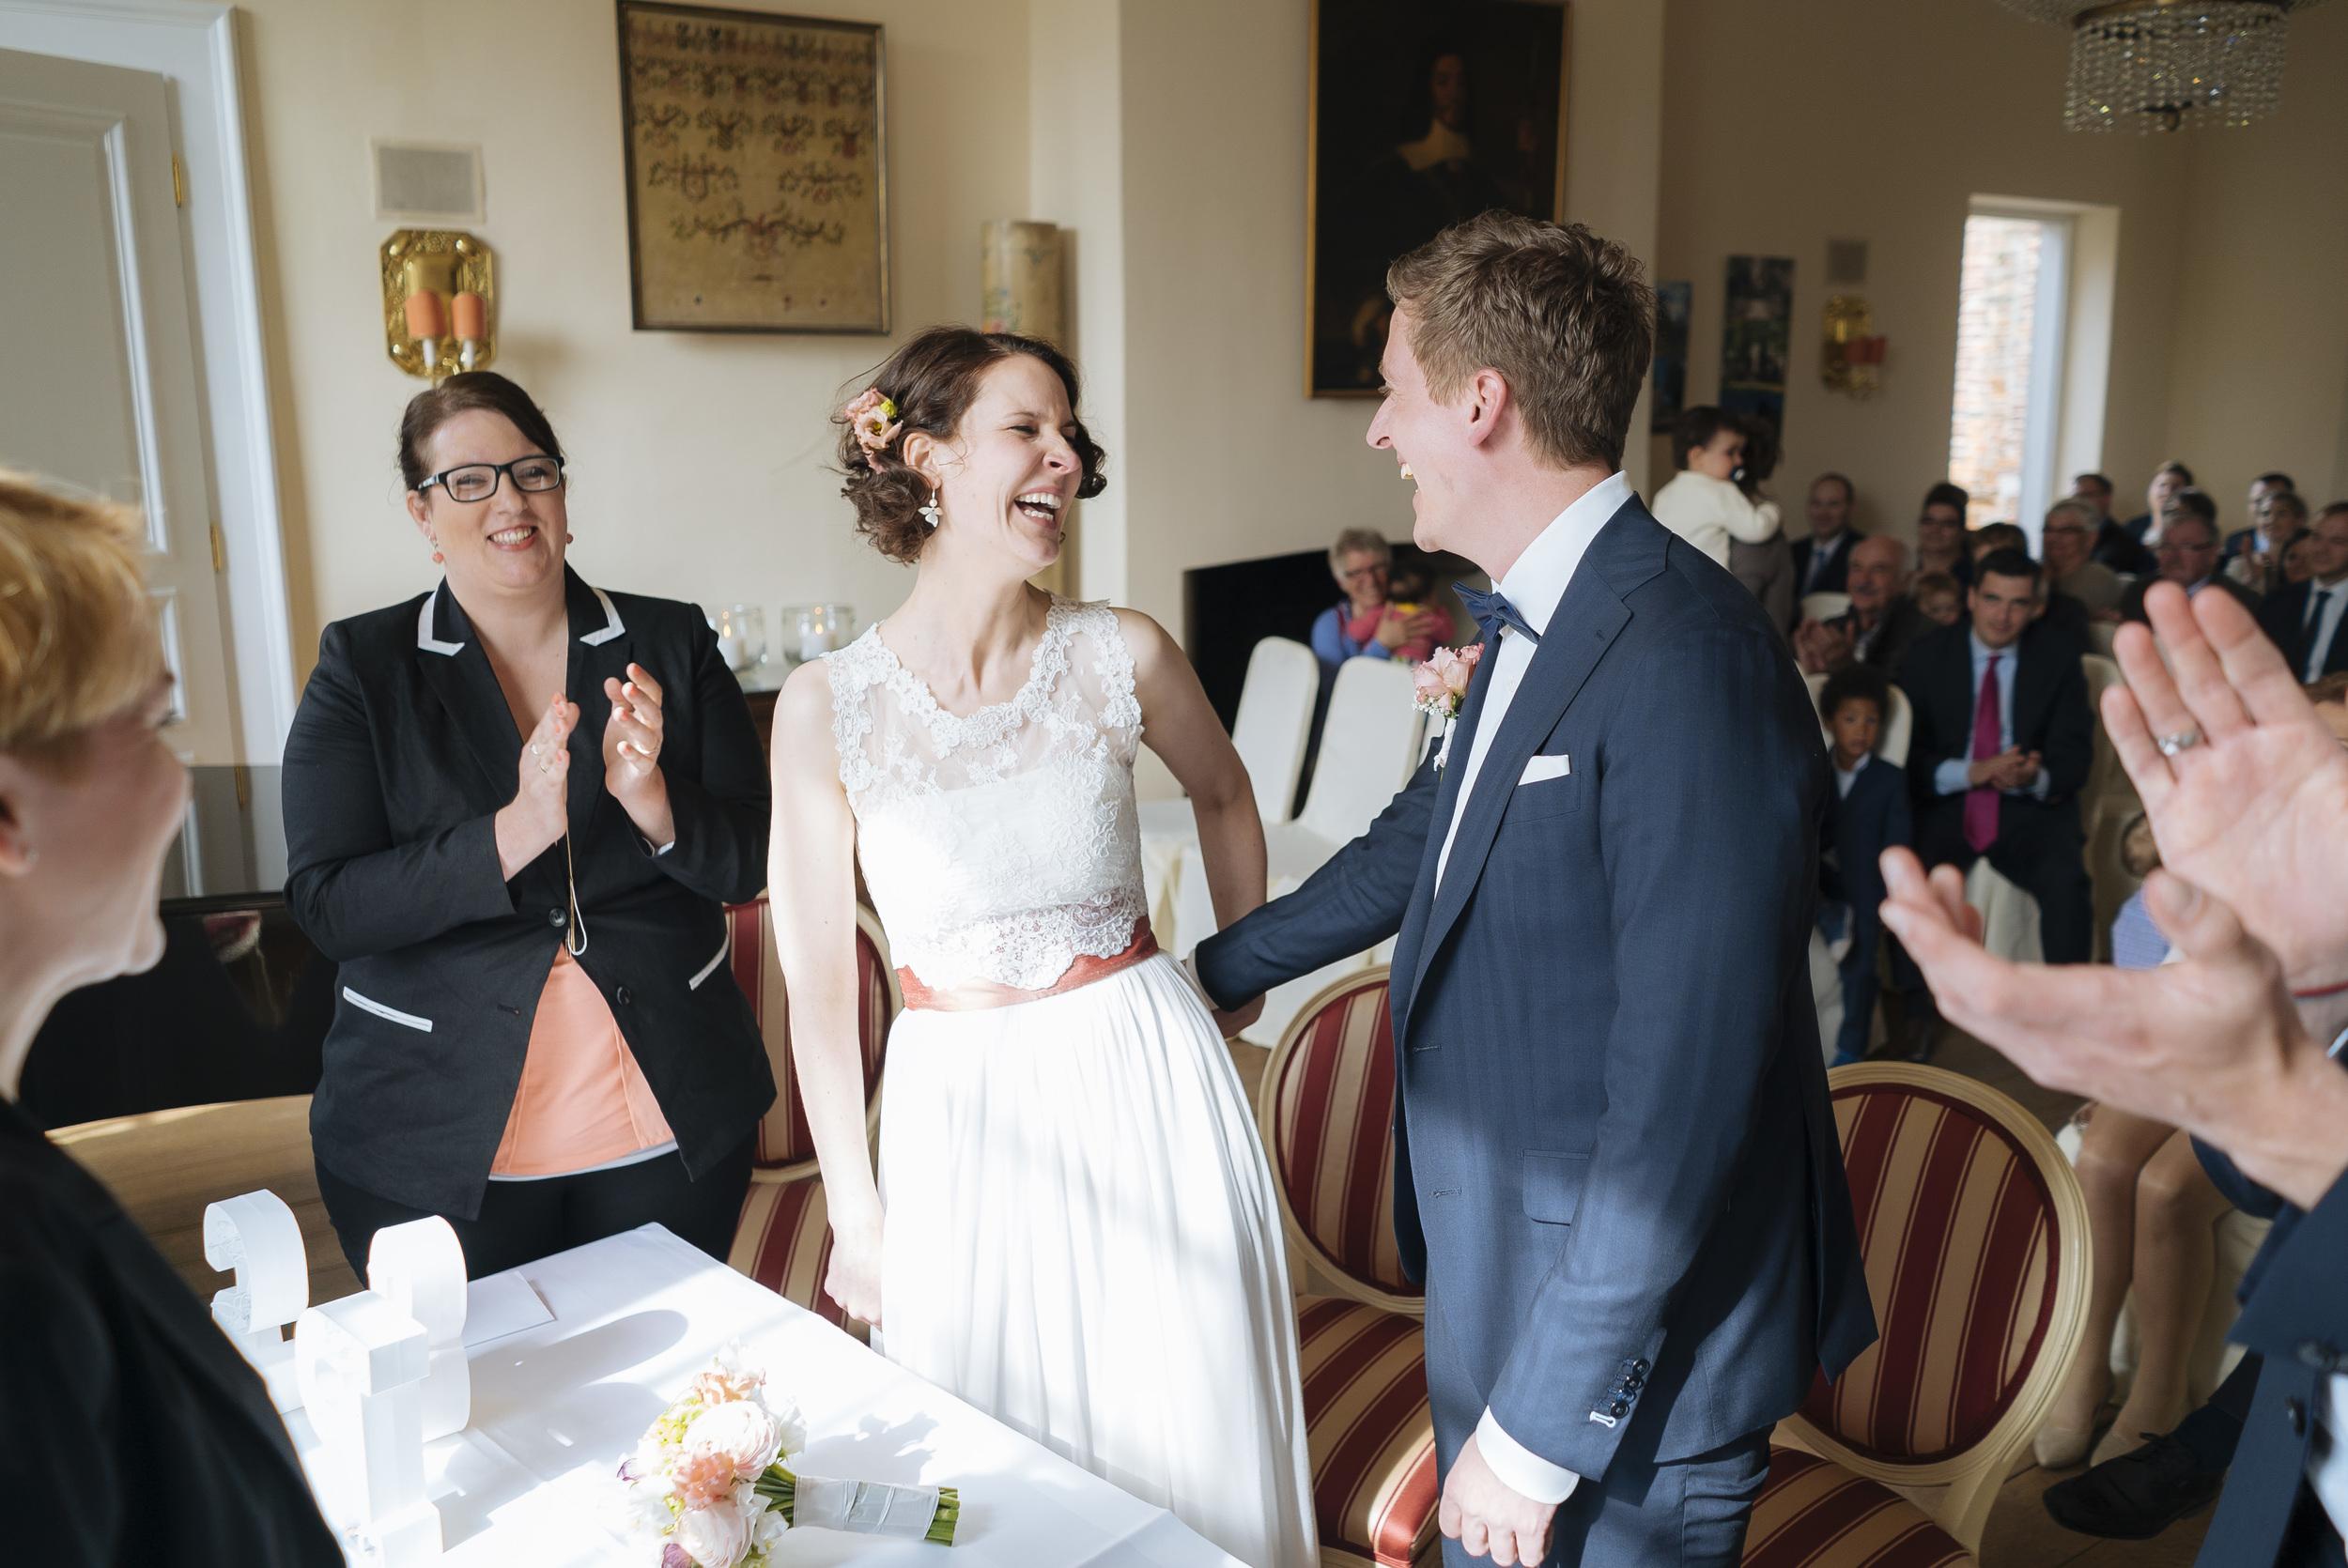 Hochzeitsfotograf-Schlossruine-Hertefeld-Weeze-074.jpg